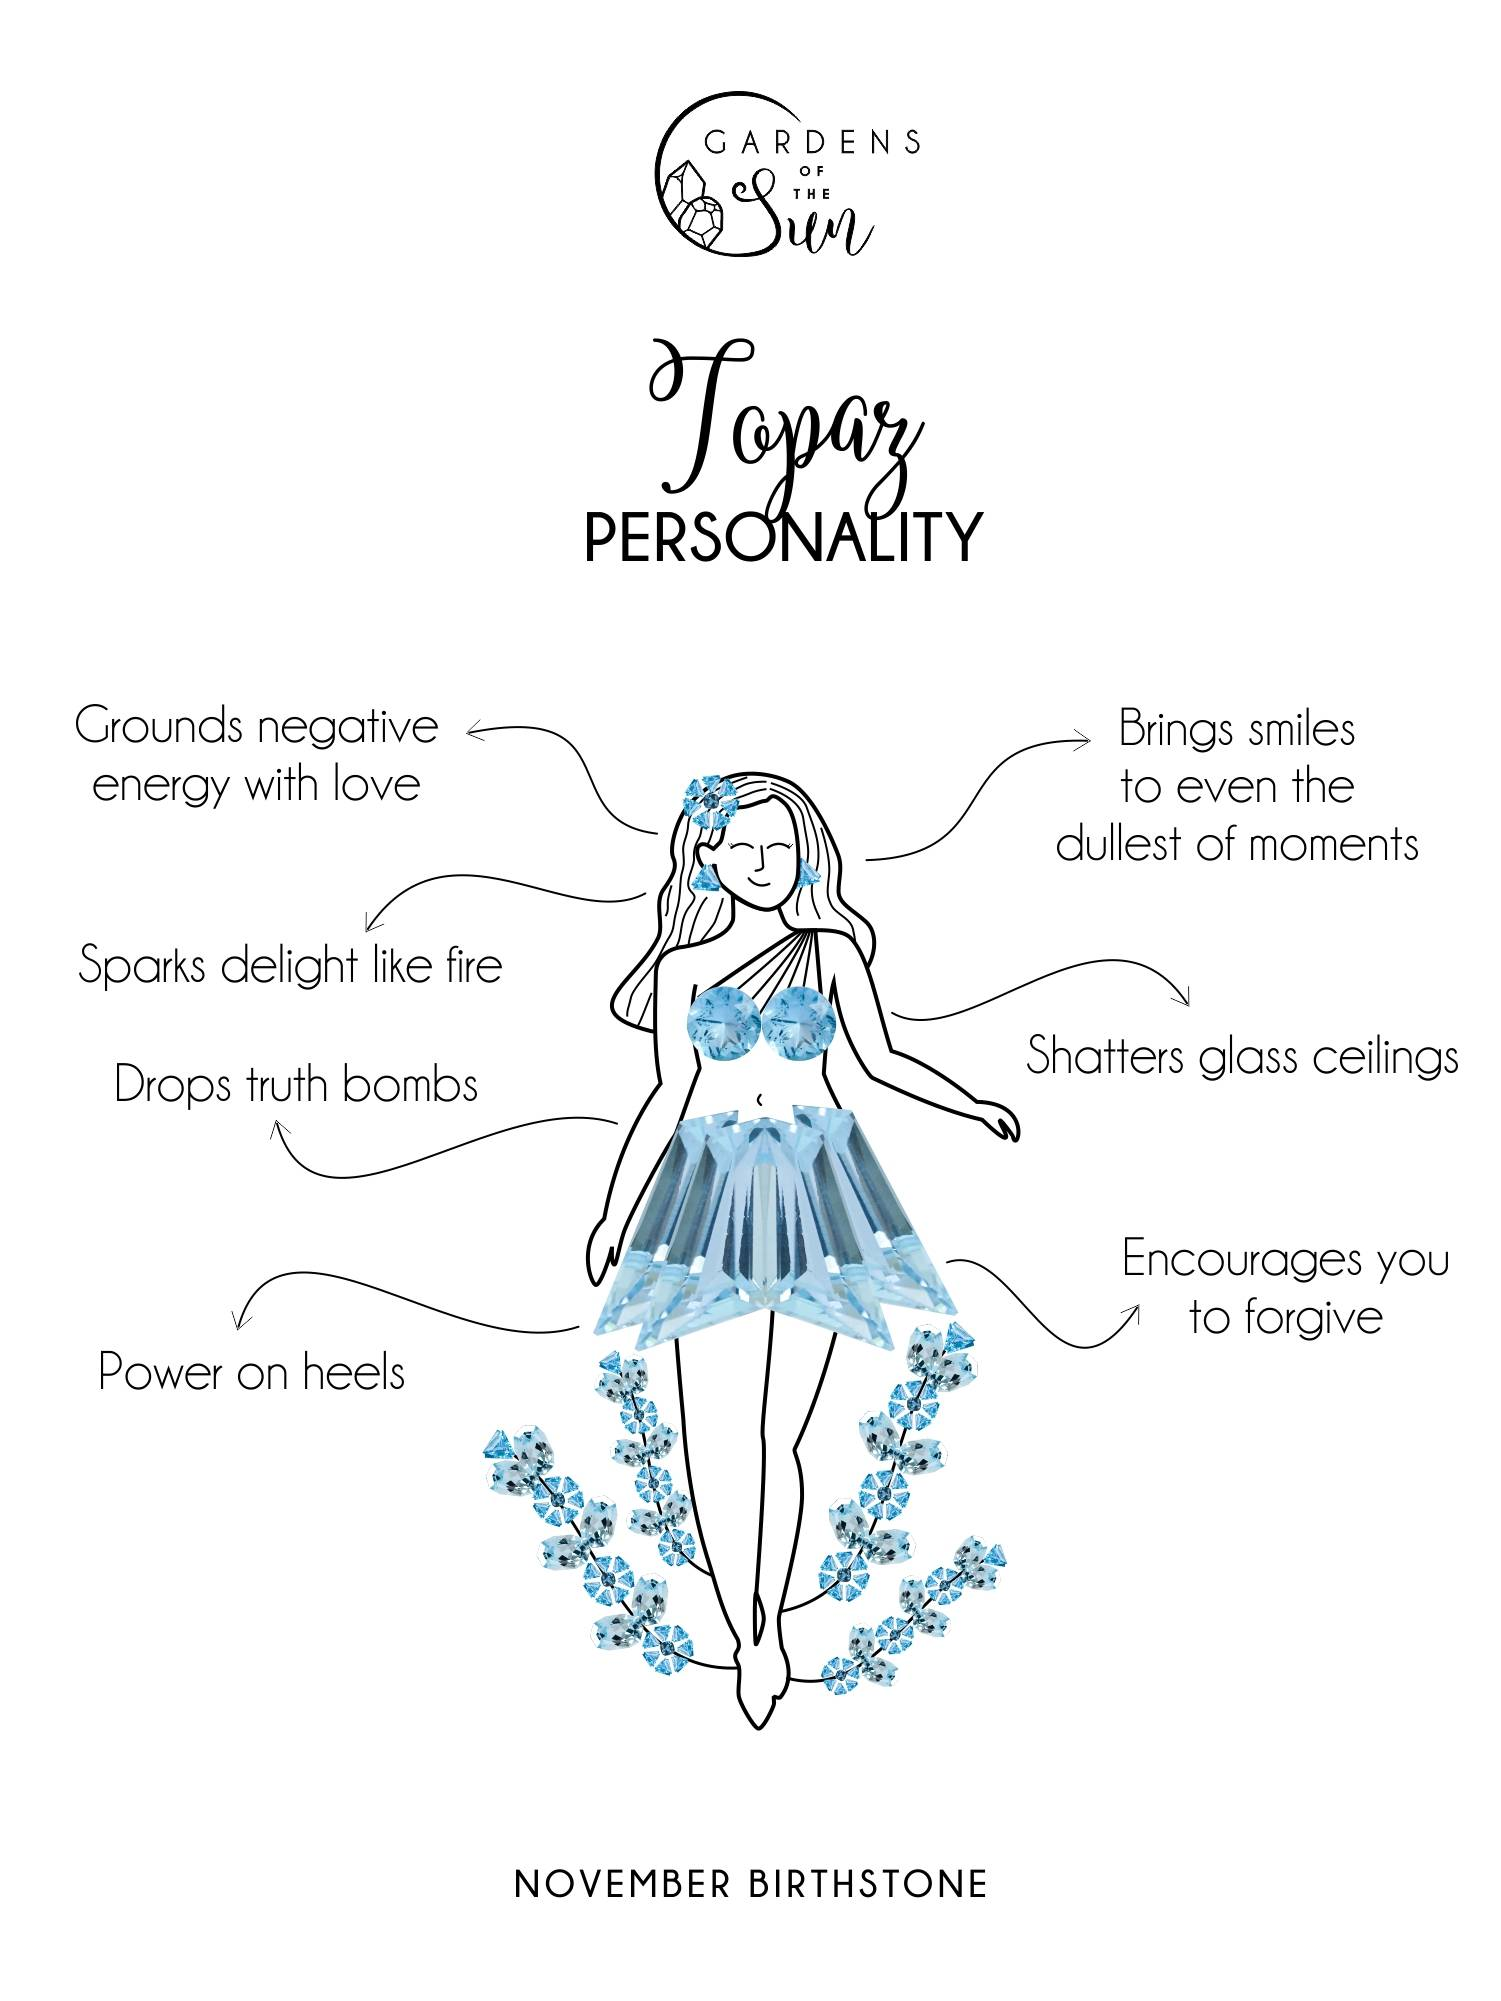 Topaz as a person